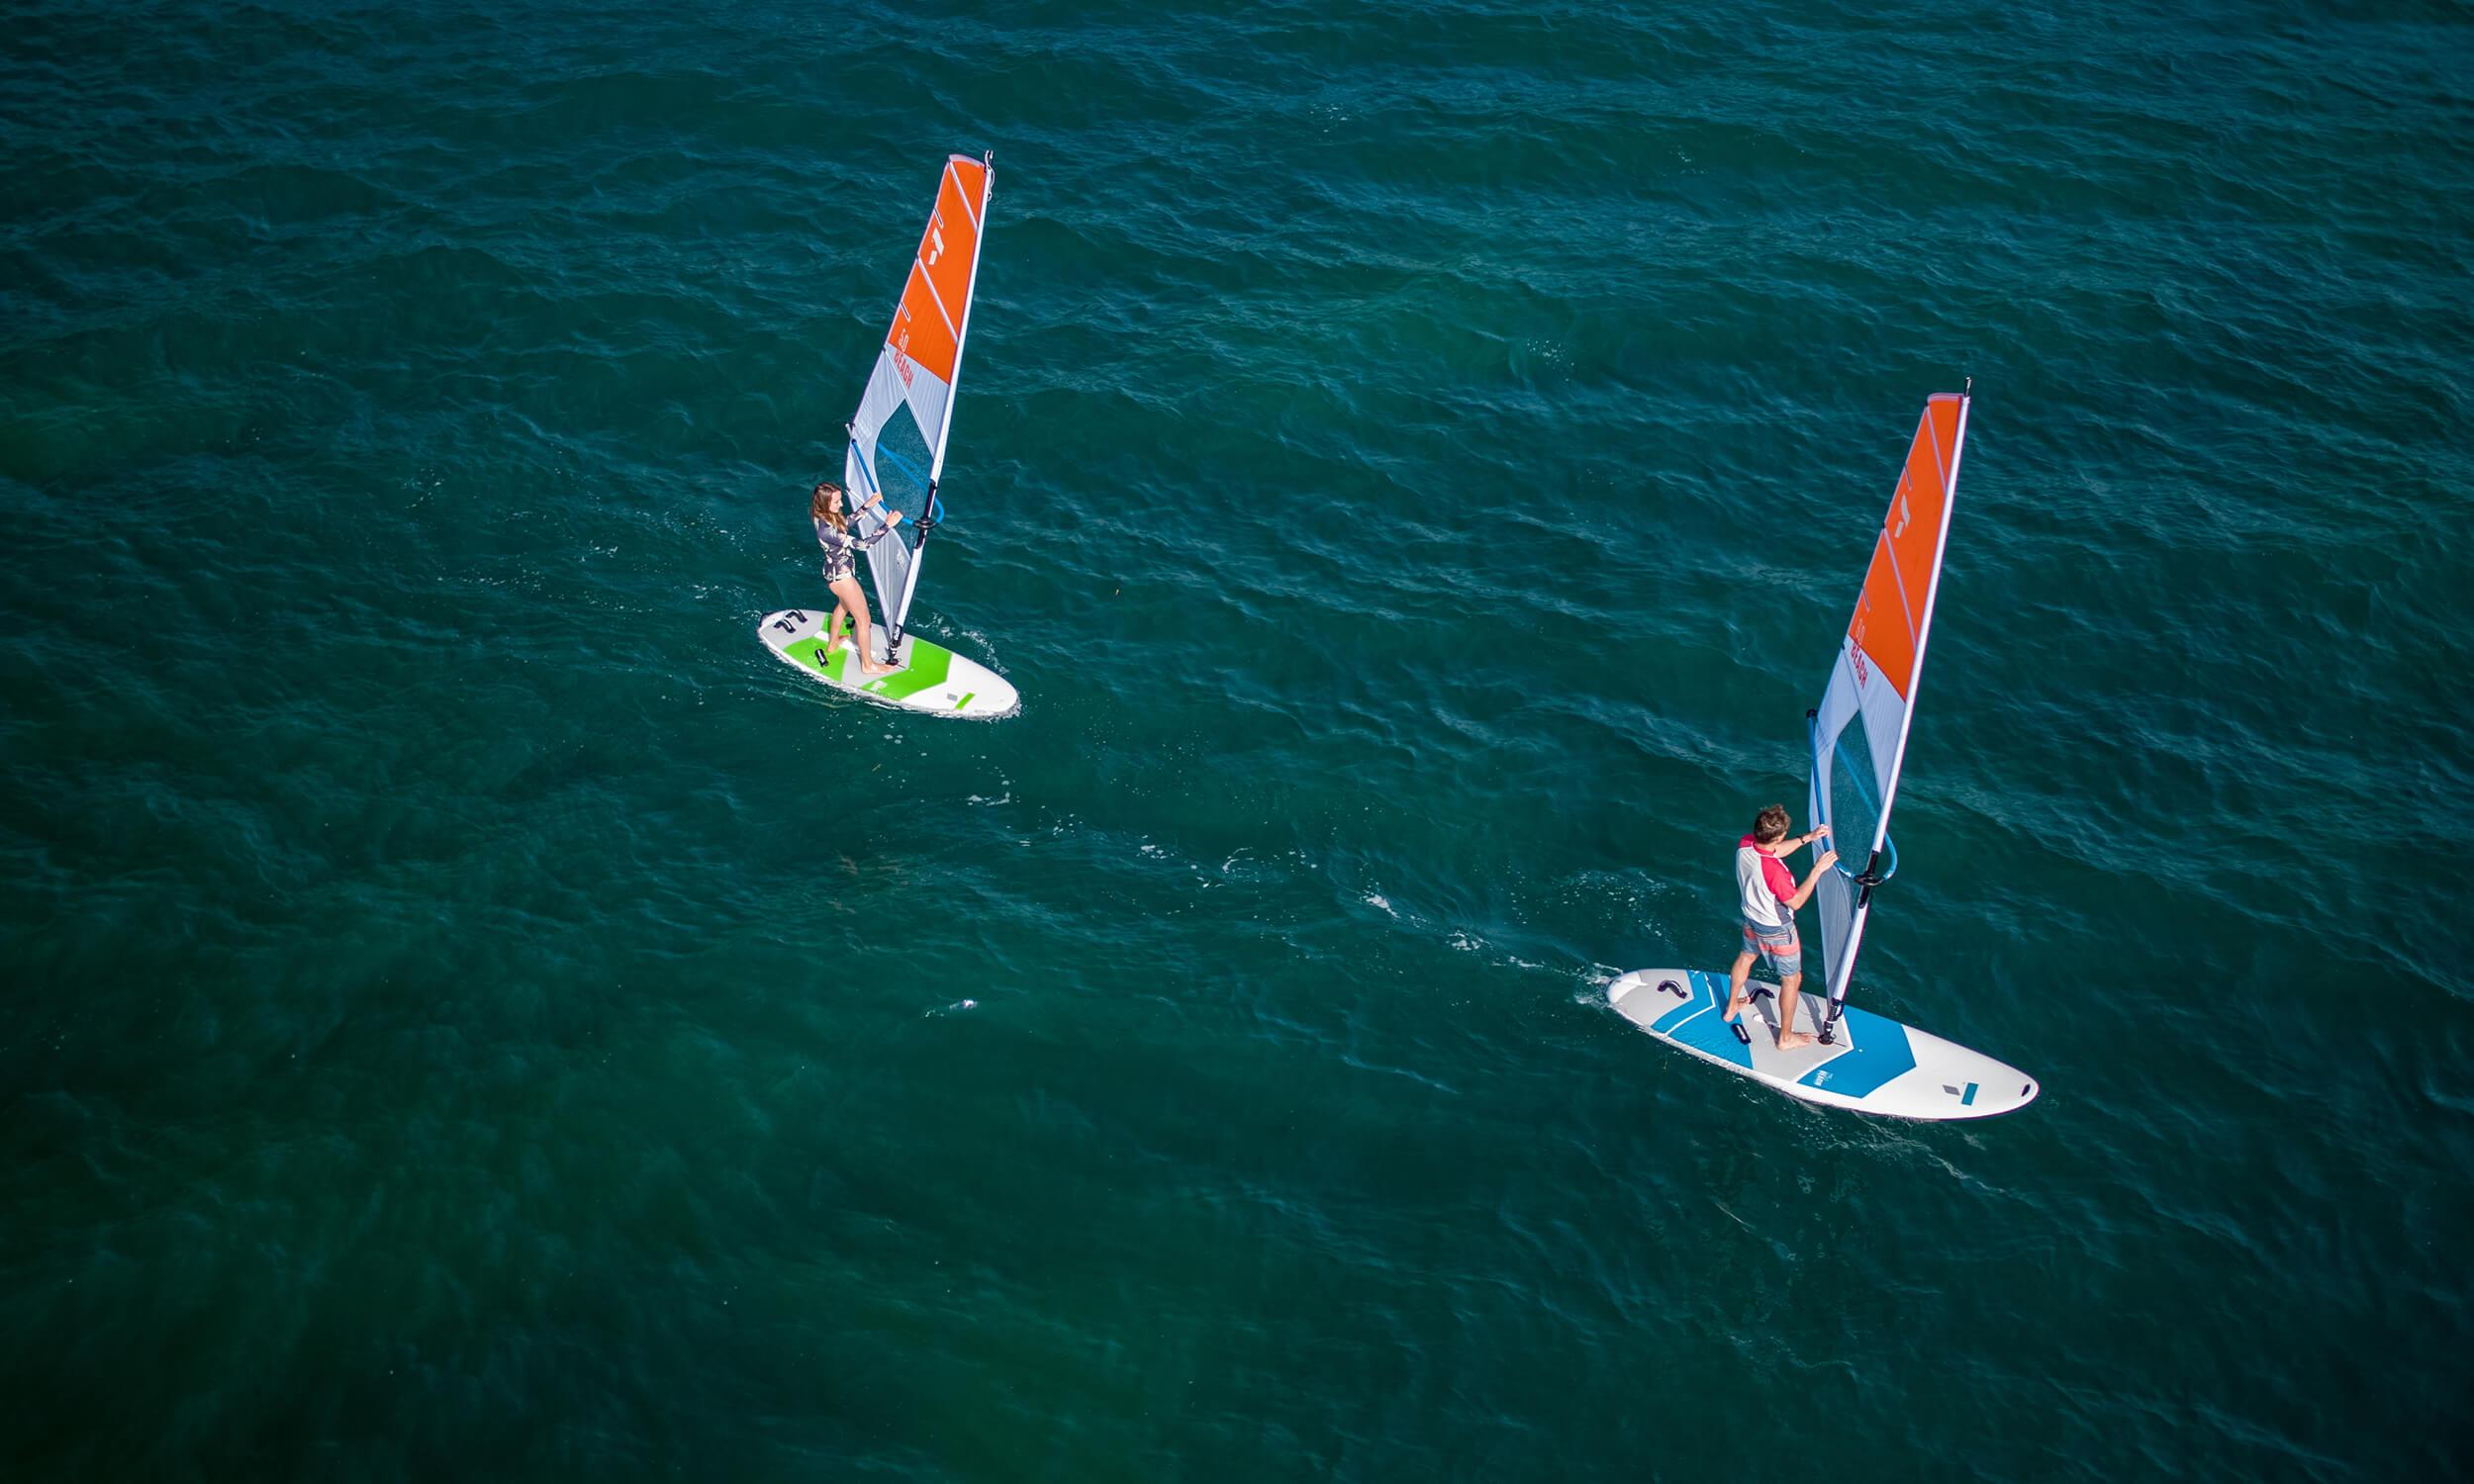 Beach windsurf series